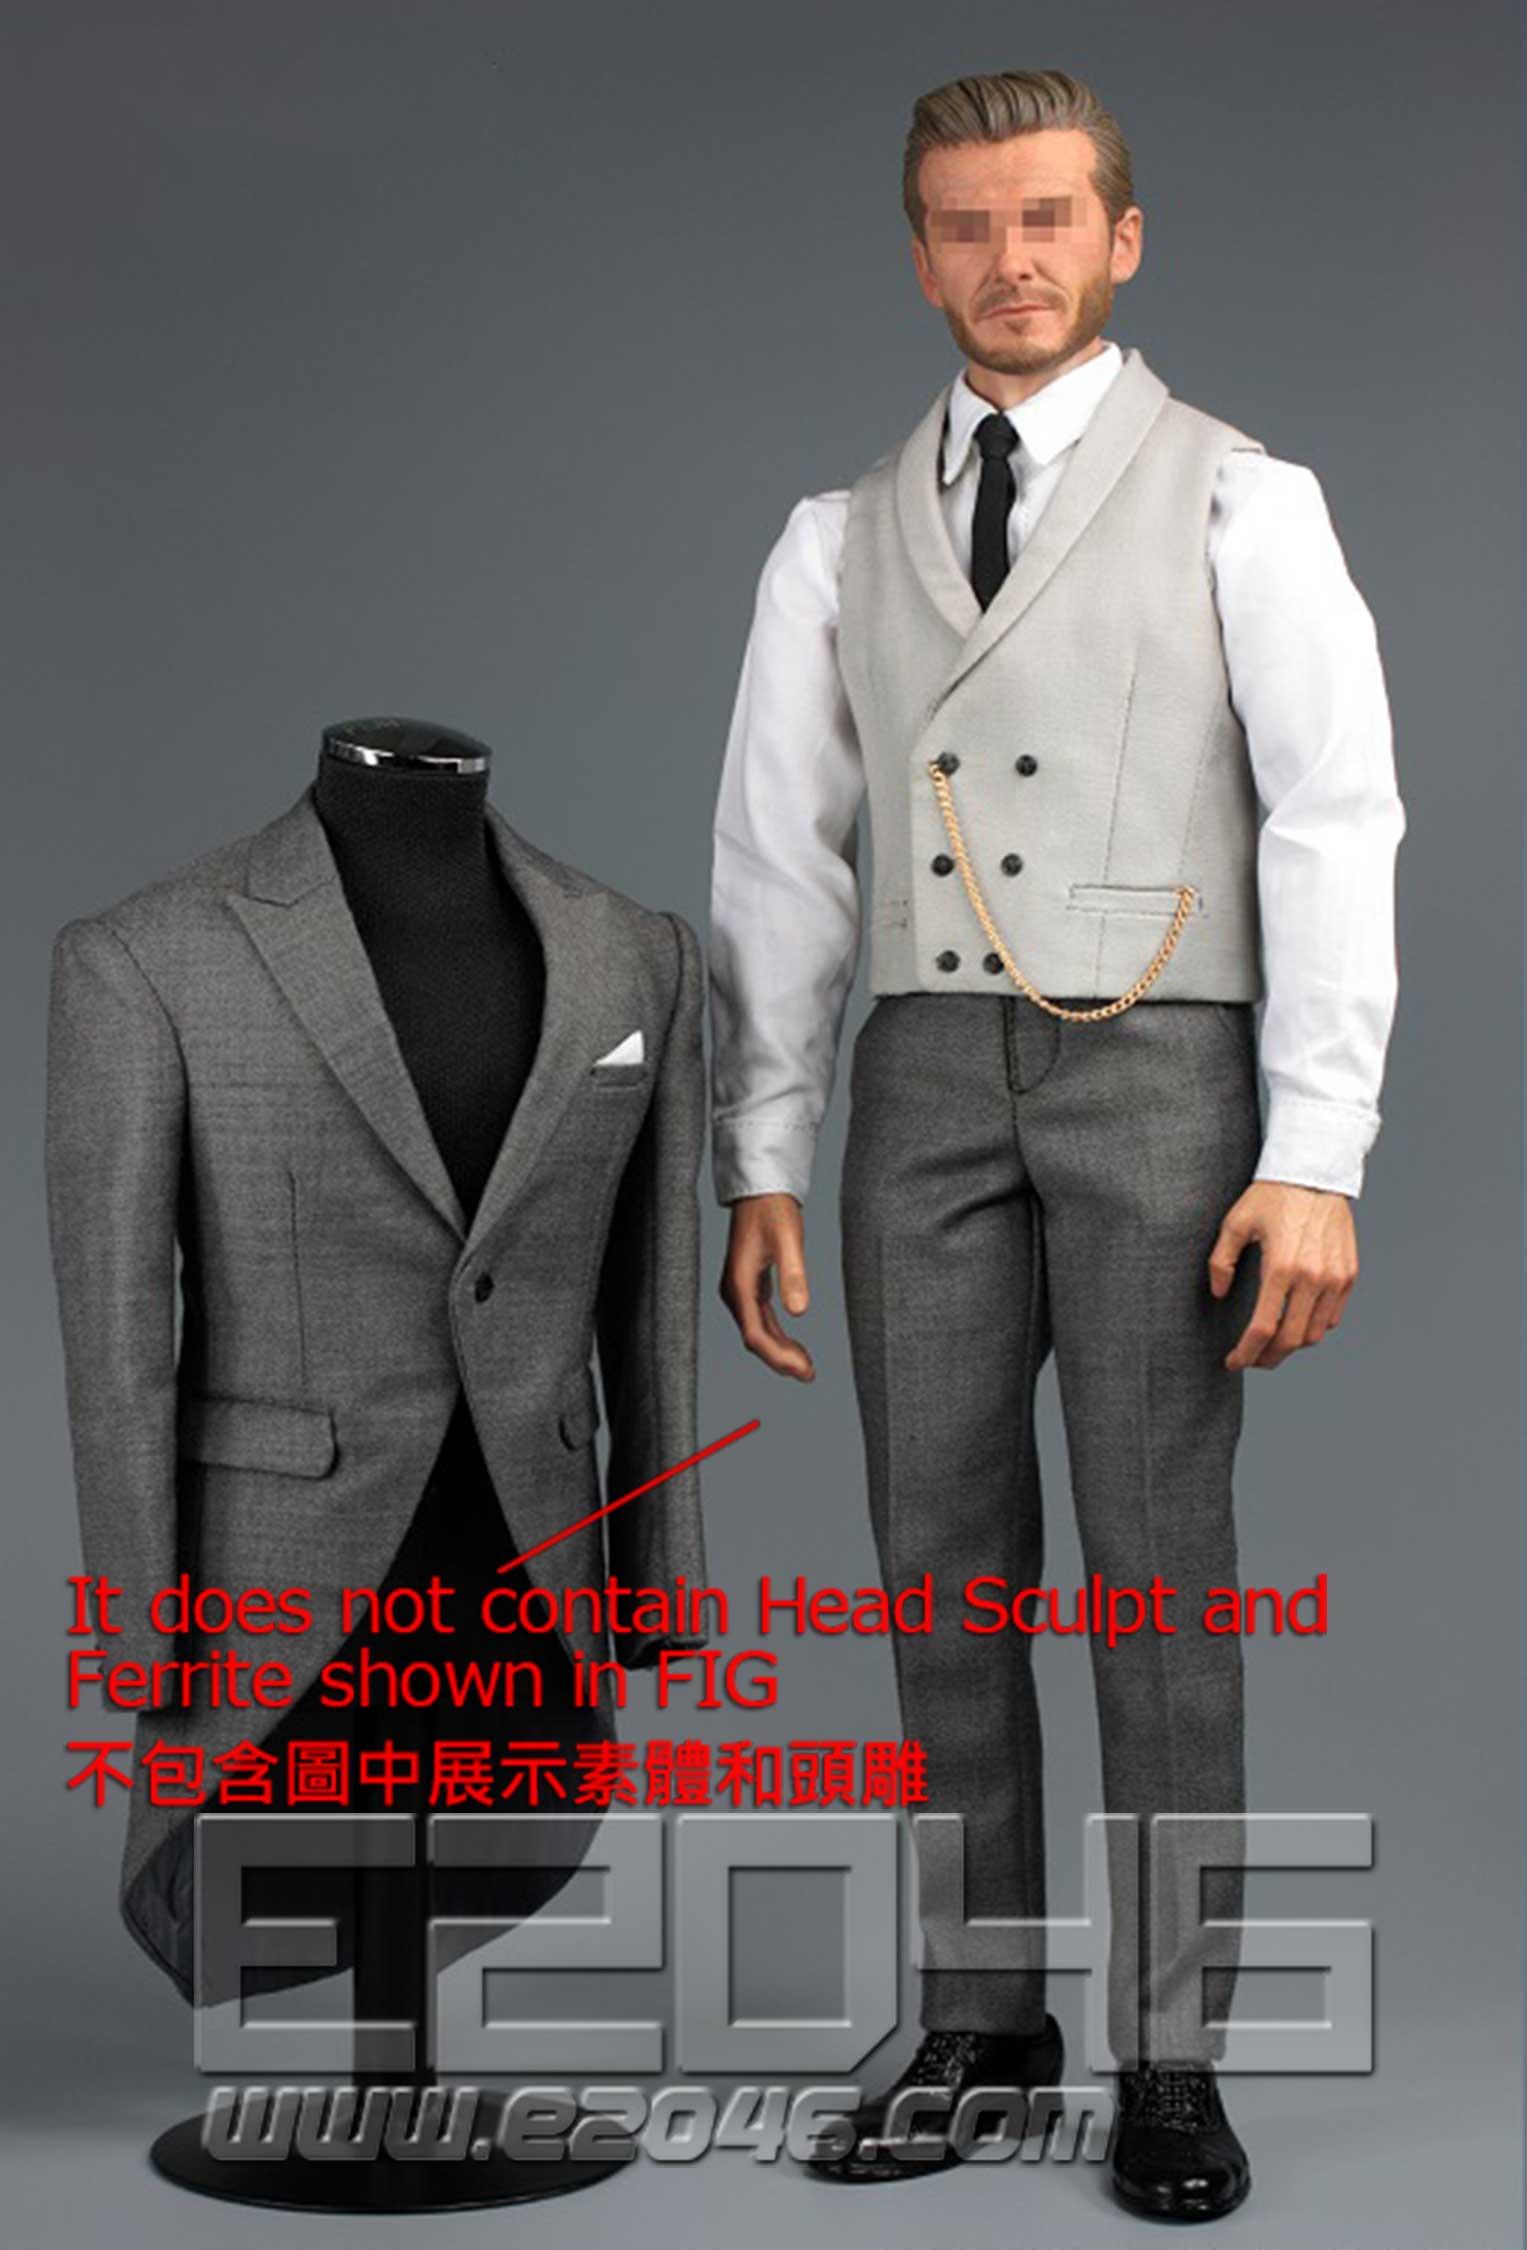 Gentlemans Dress C (DOLL)